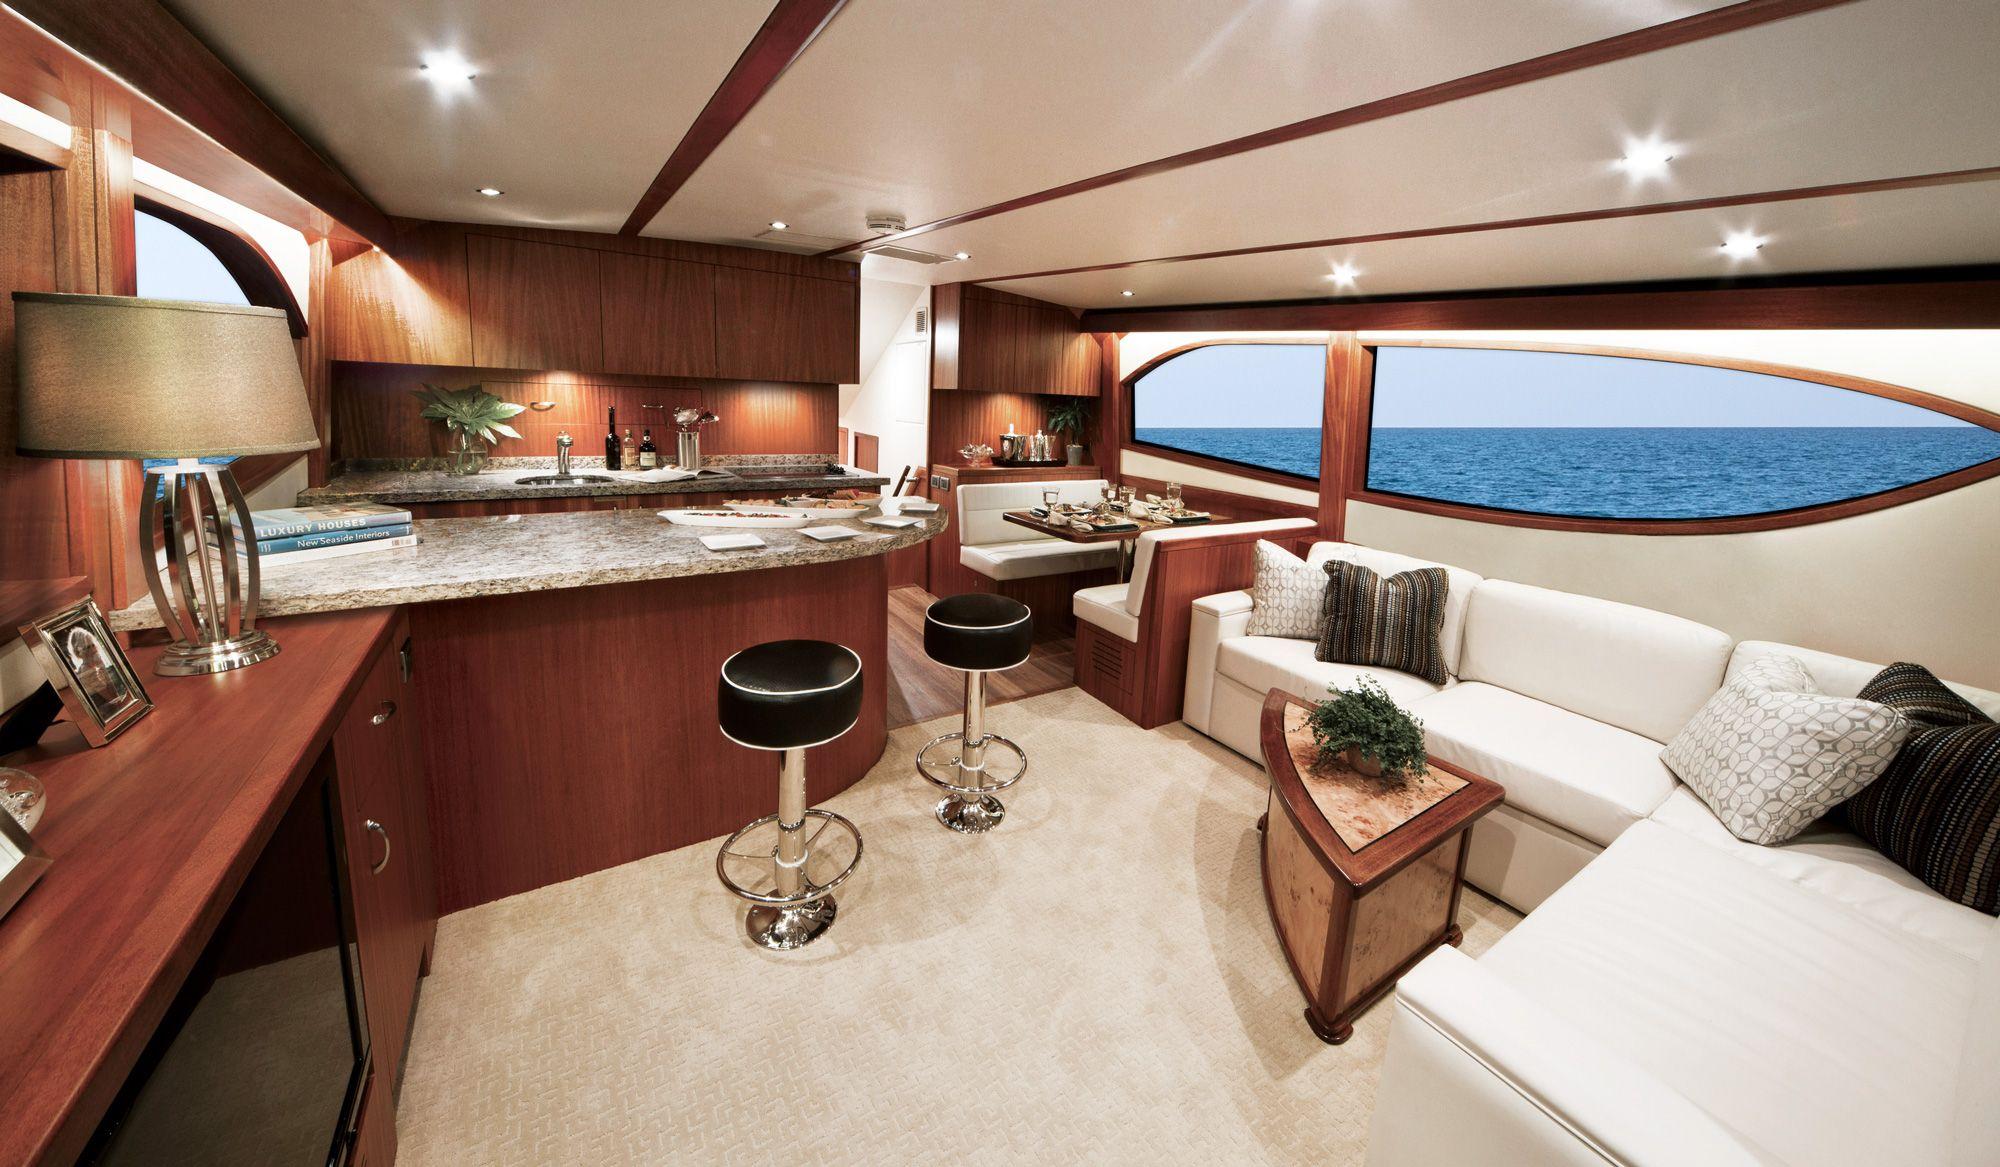 Hatteras Motor Yacht Interior Yacht Charter & Superyacht News